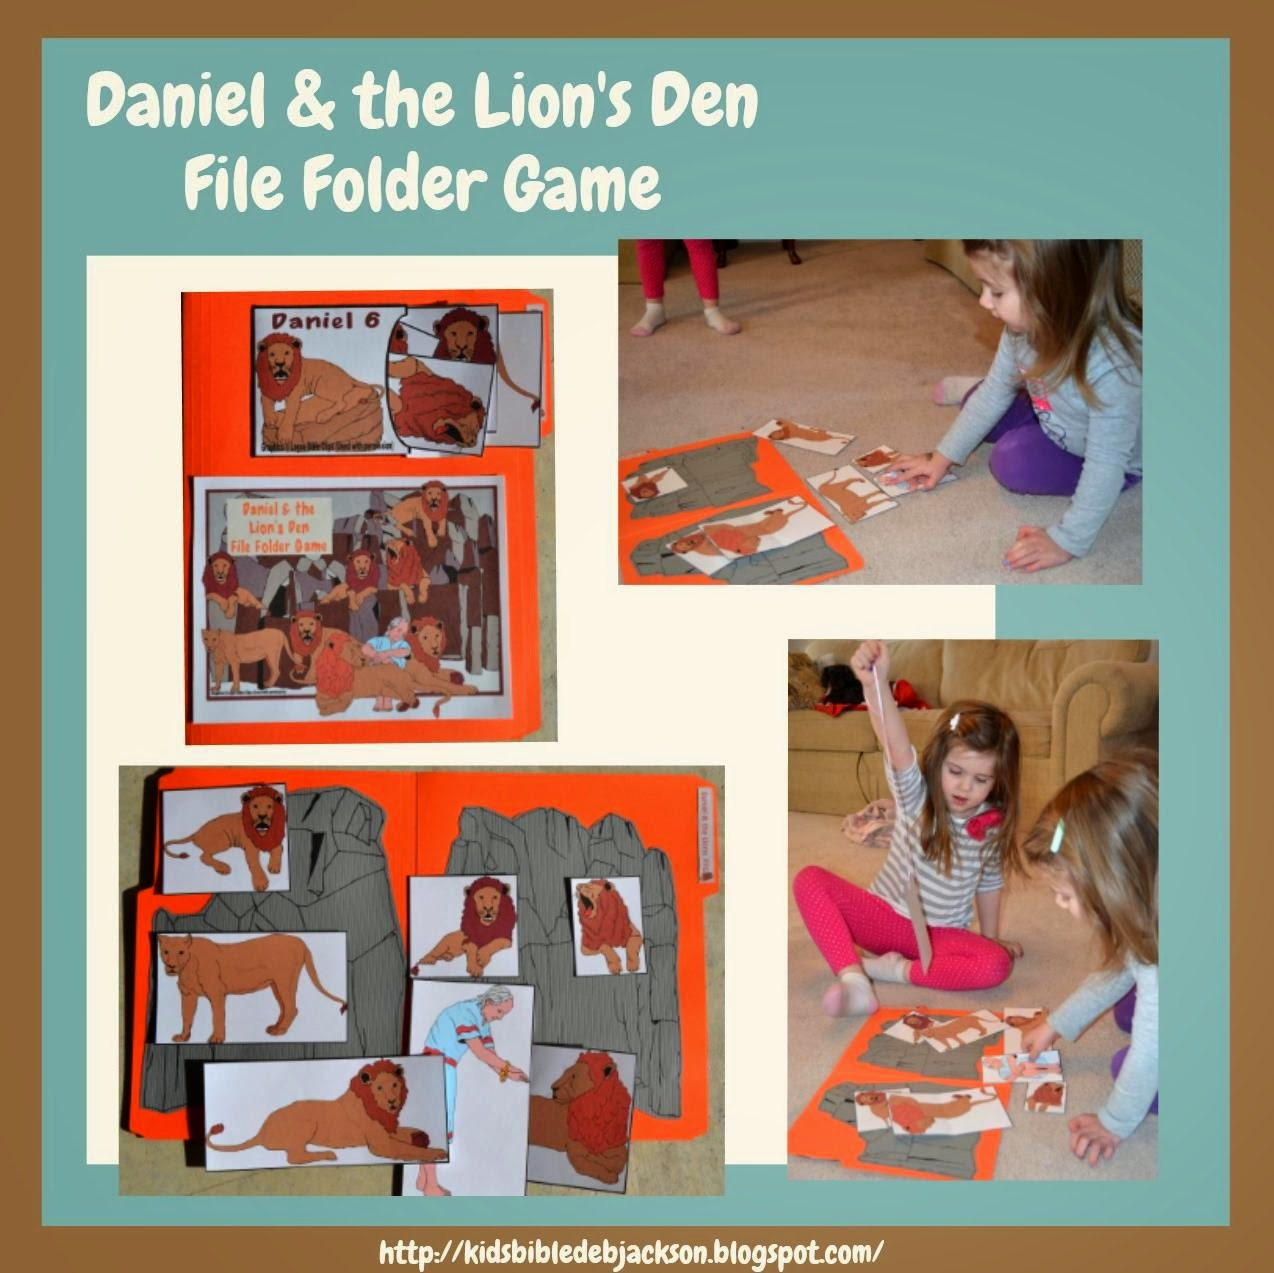 http://kidsbibledebjackson.blogspot.com/2014/02/preschool-alphabet-l-is-for-lions.html